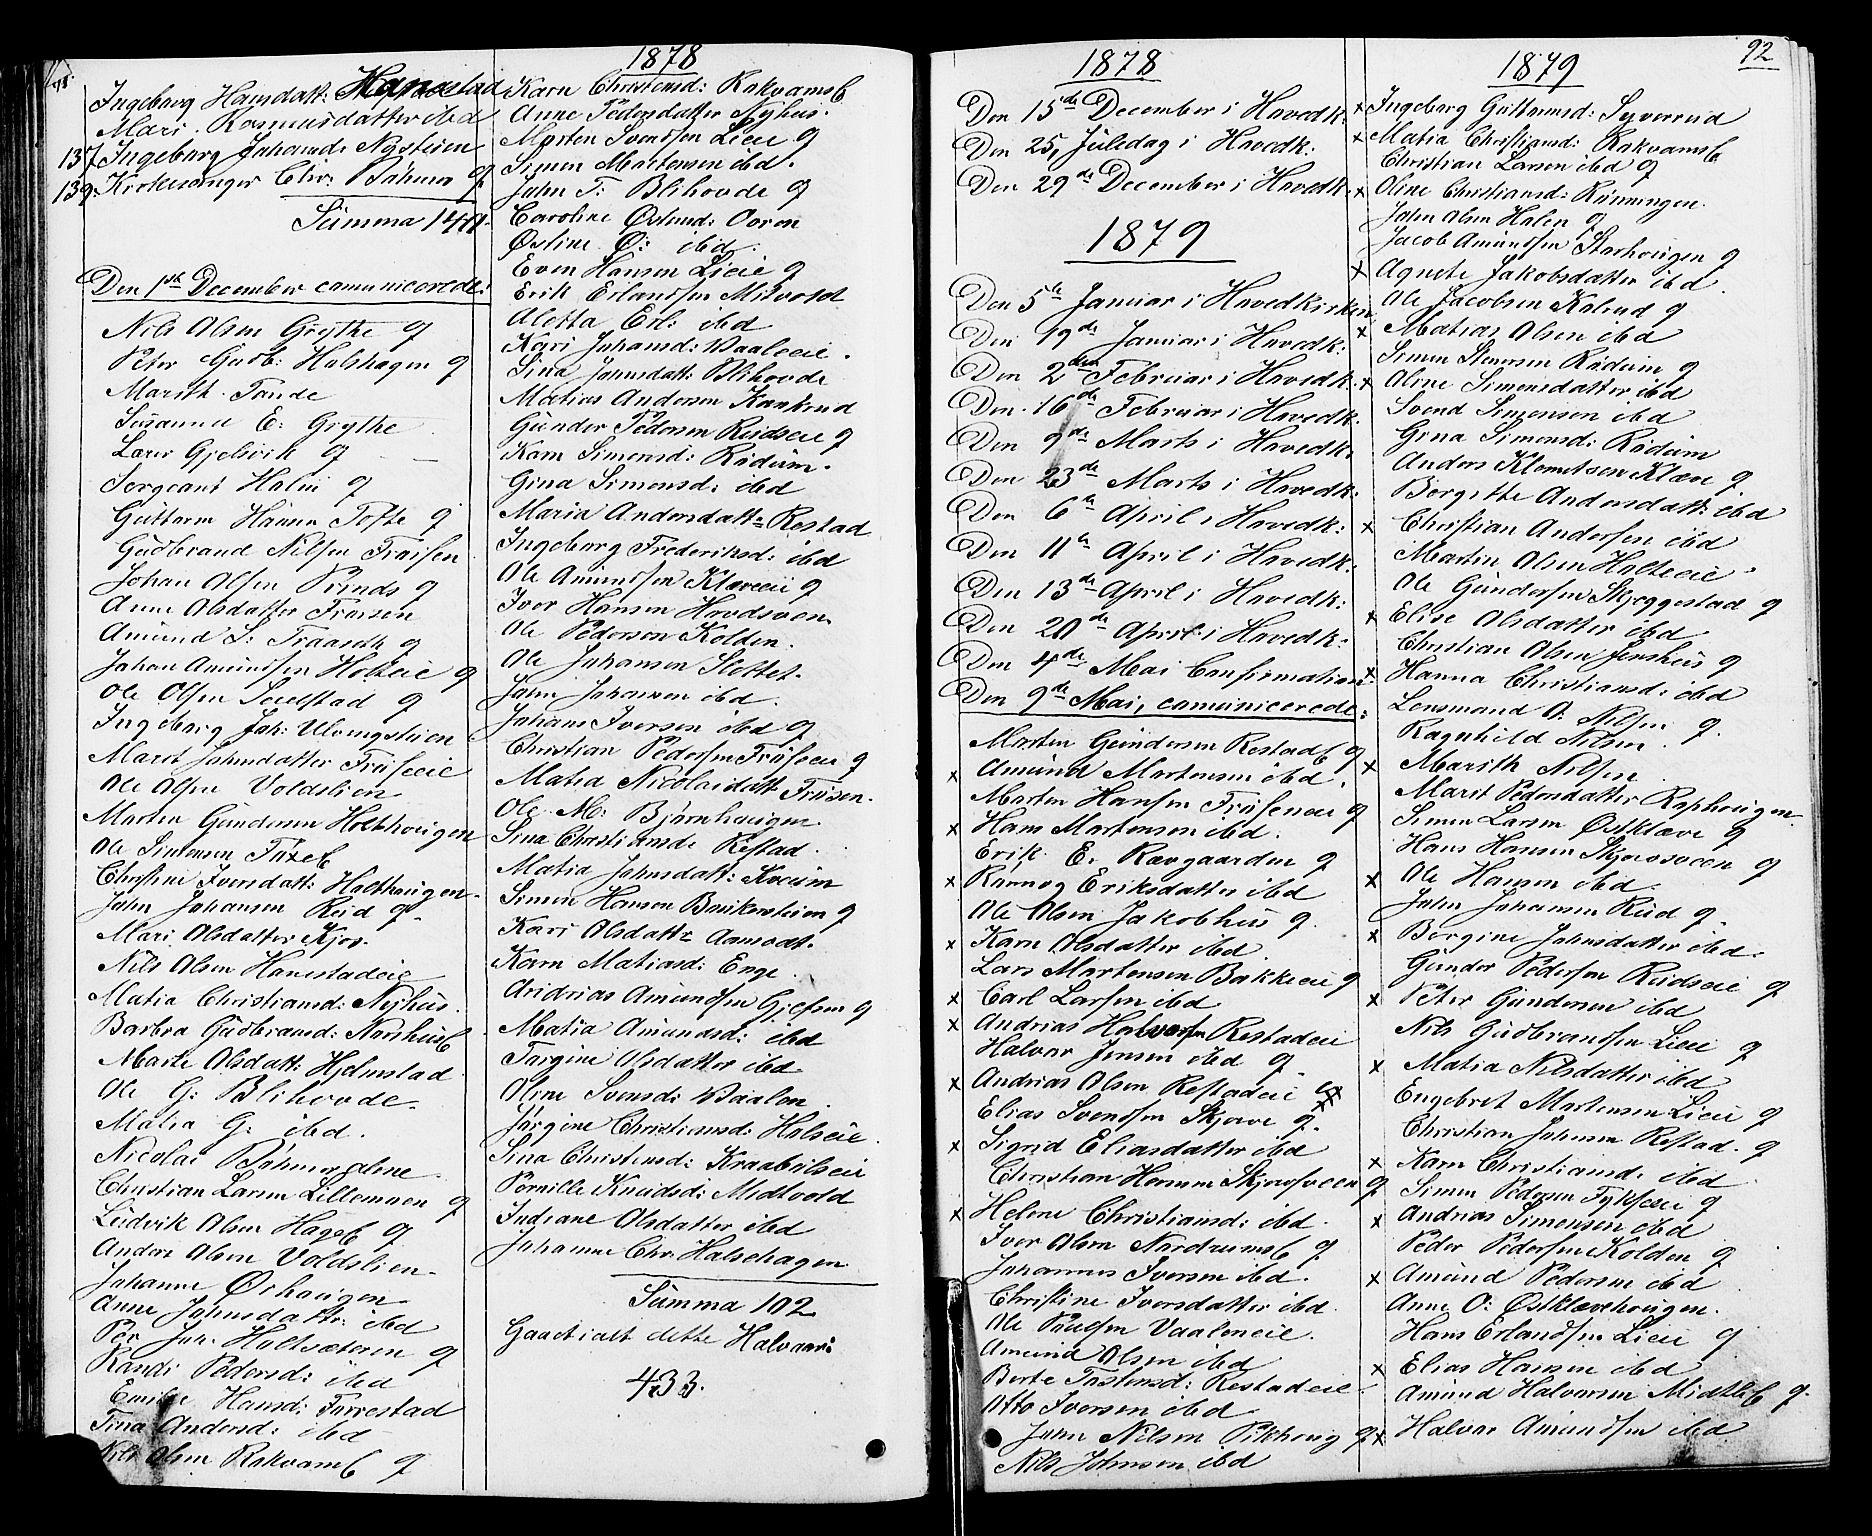 SAH, Østre Gausdal prestekontor, Klokkerbok nr. 1, 1863-1893, s. 91-92